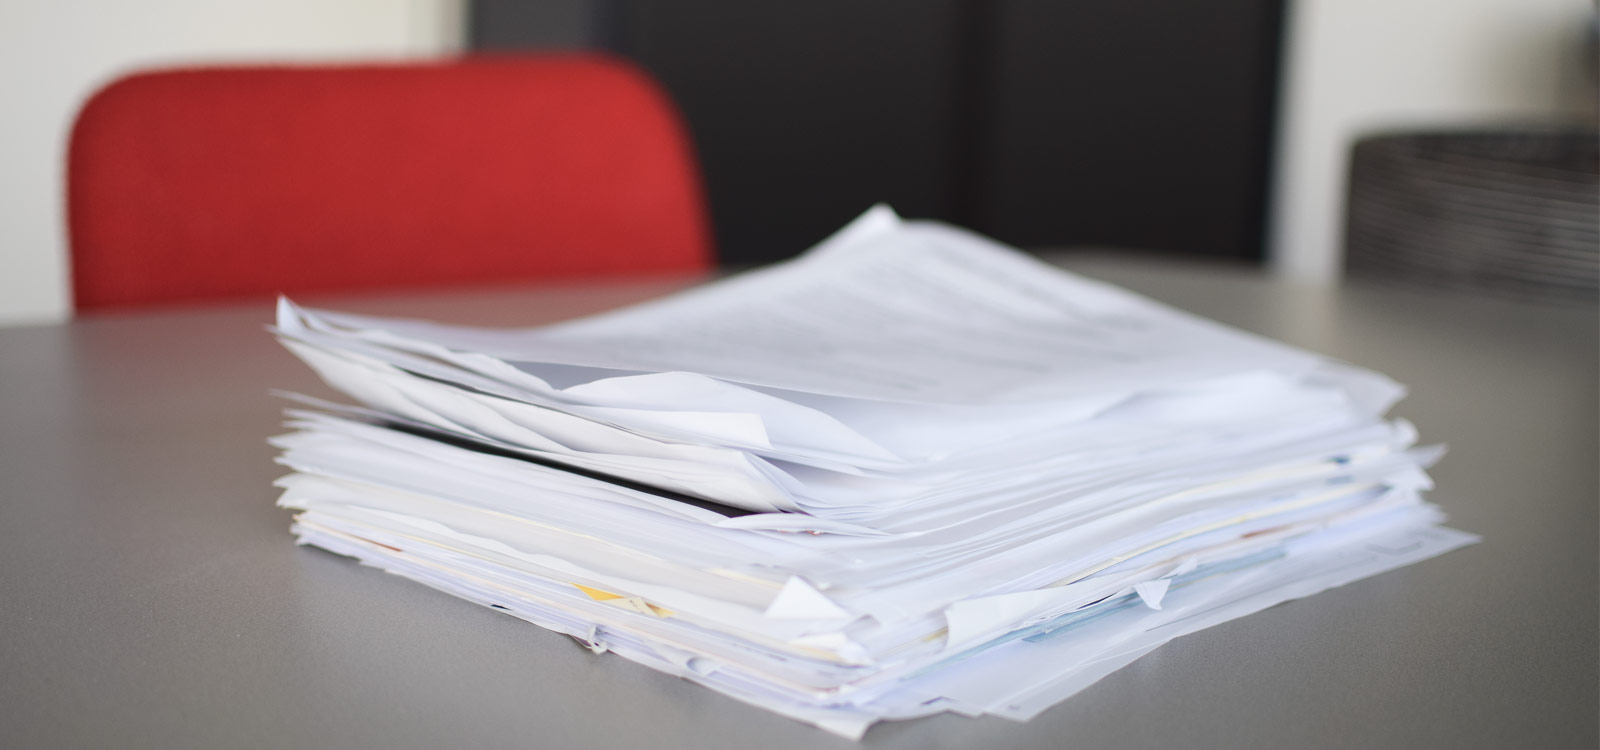 papier-op-tafel-wet-bescherming-persoonsgegevens